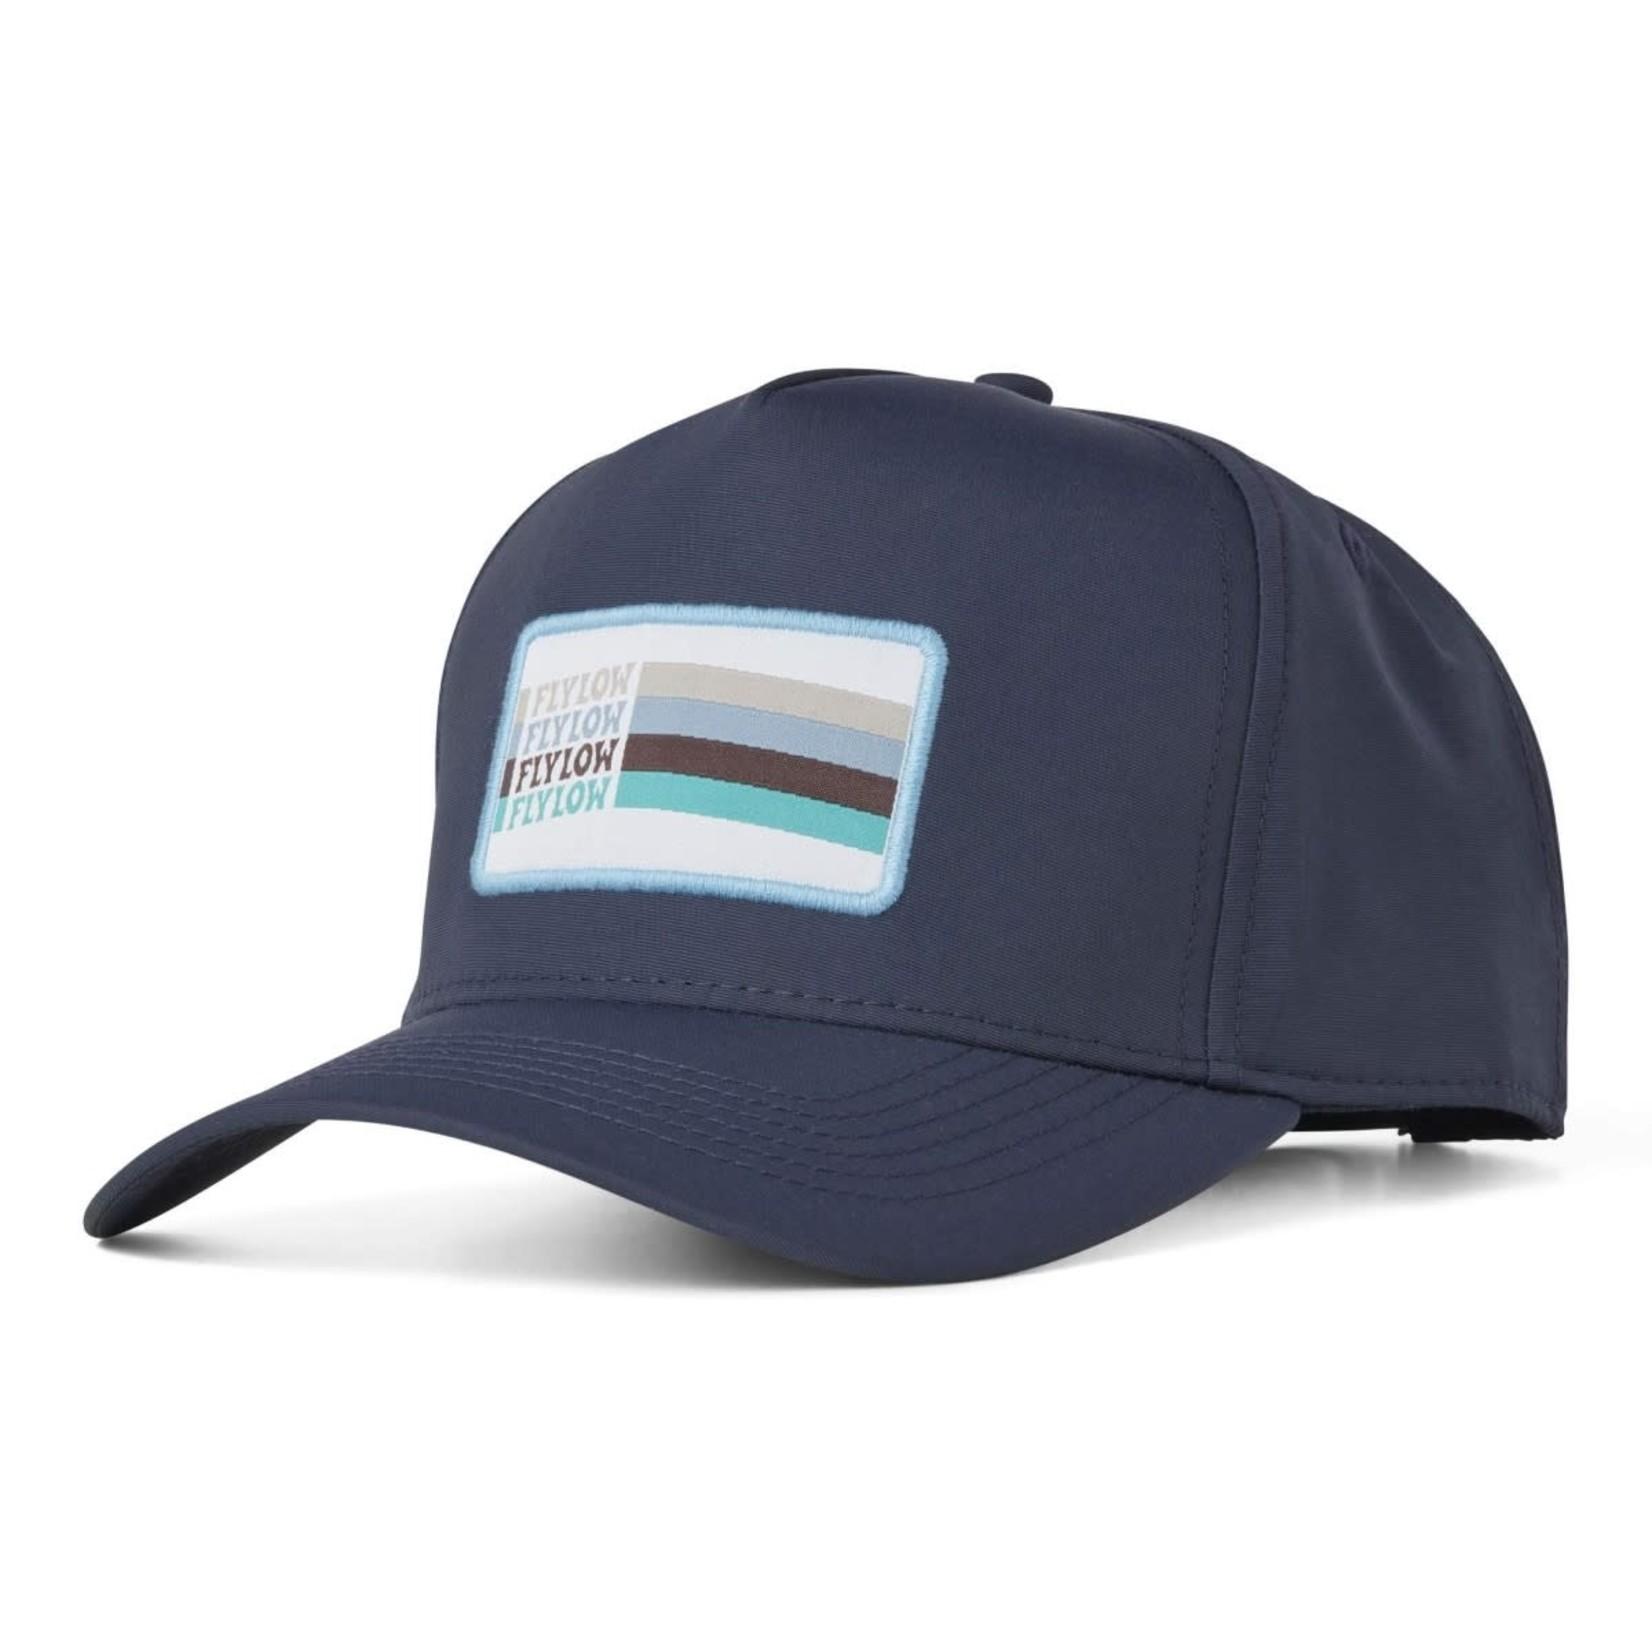 Flylow Casquette Flylow Cream Soda Trucker Hat